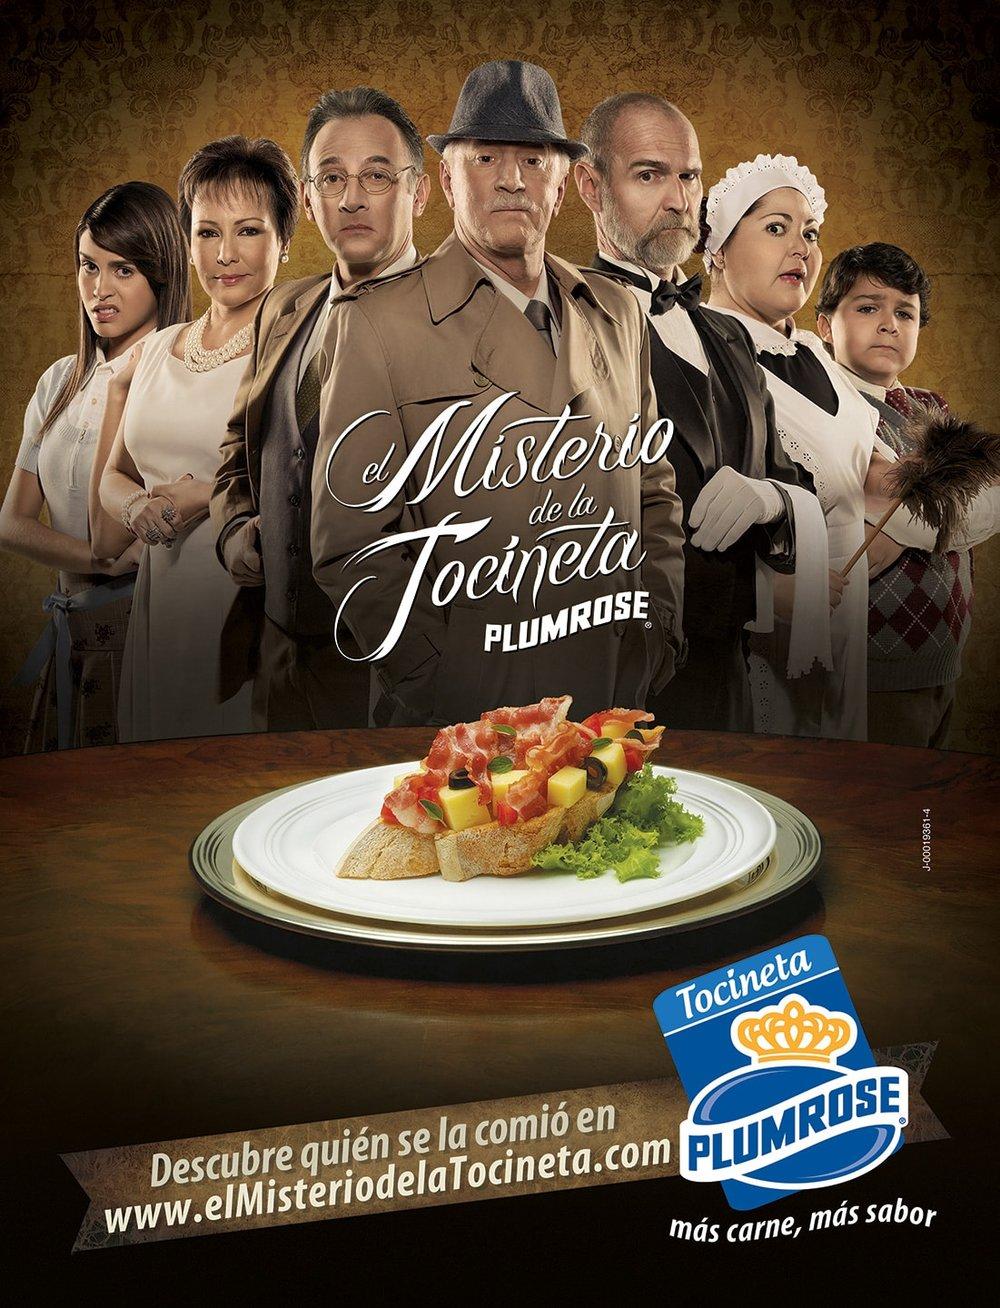 plumrose-campaign-advertising-photograper-miami-marcel-boldu.jpg